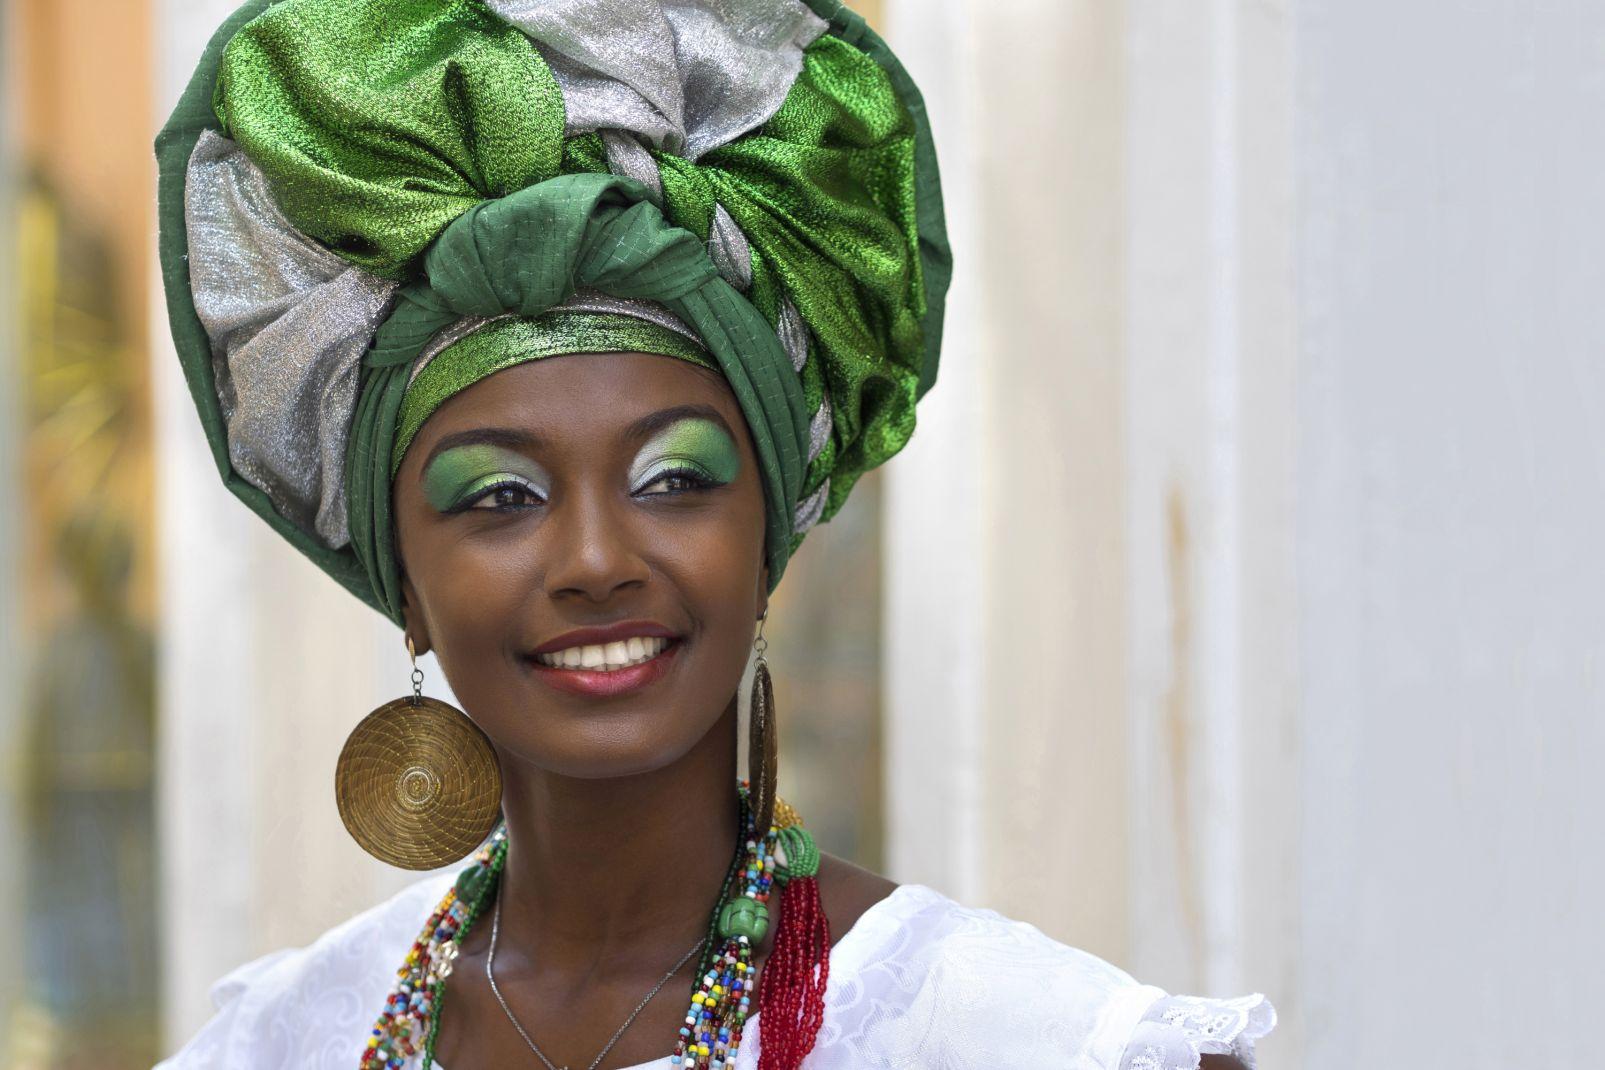 bahia, bahiana, baiana, amérique, sud, brésil, portrait, femme, ethnie